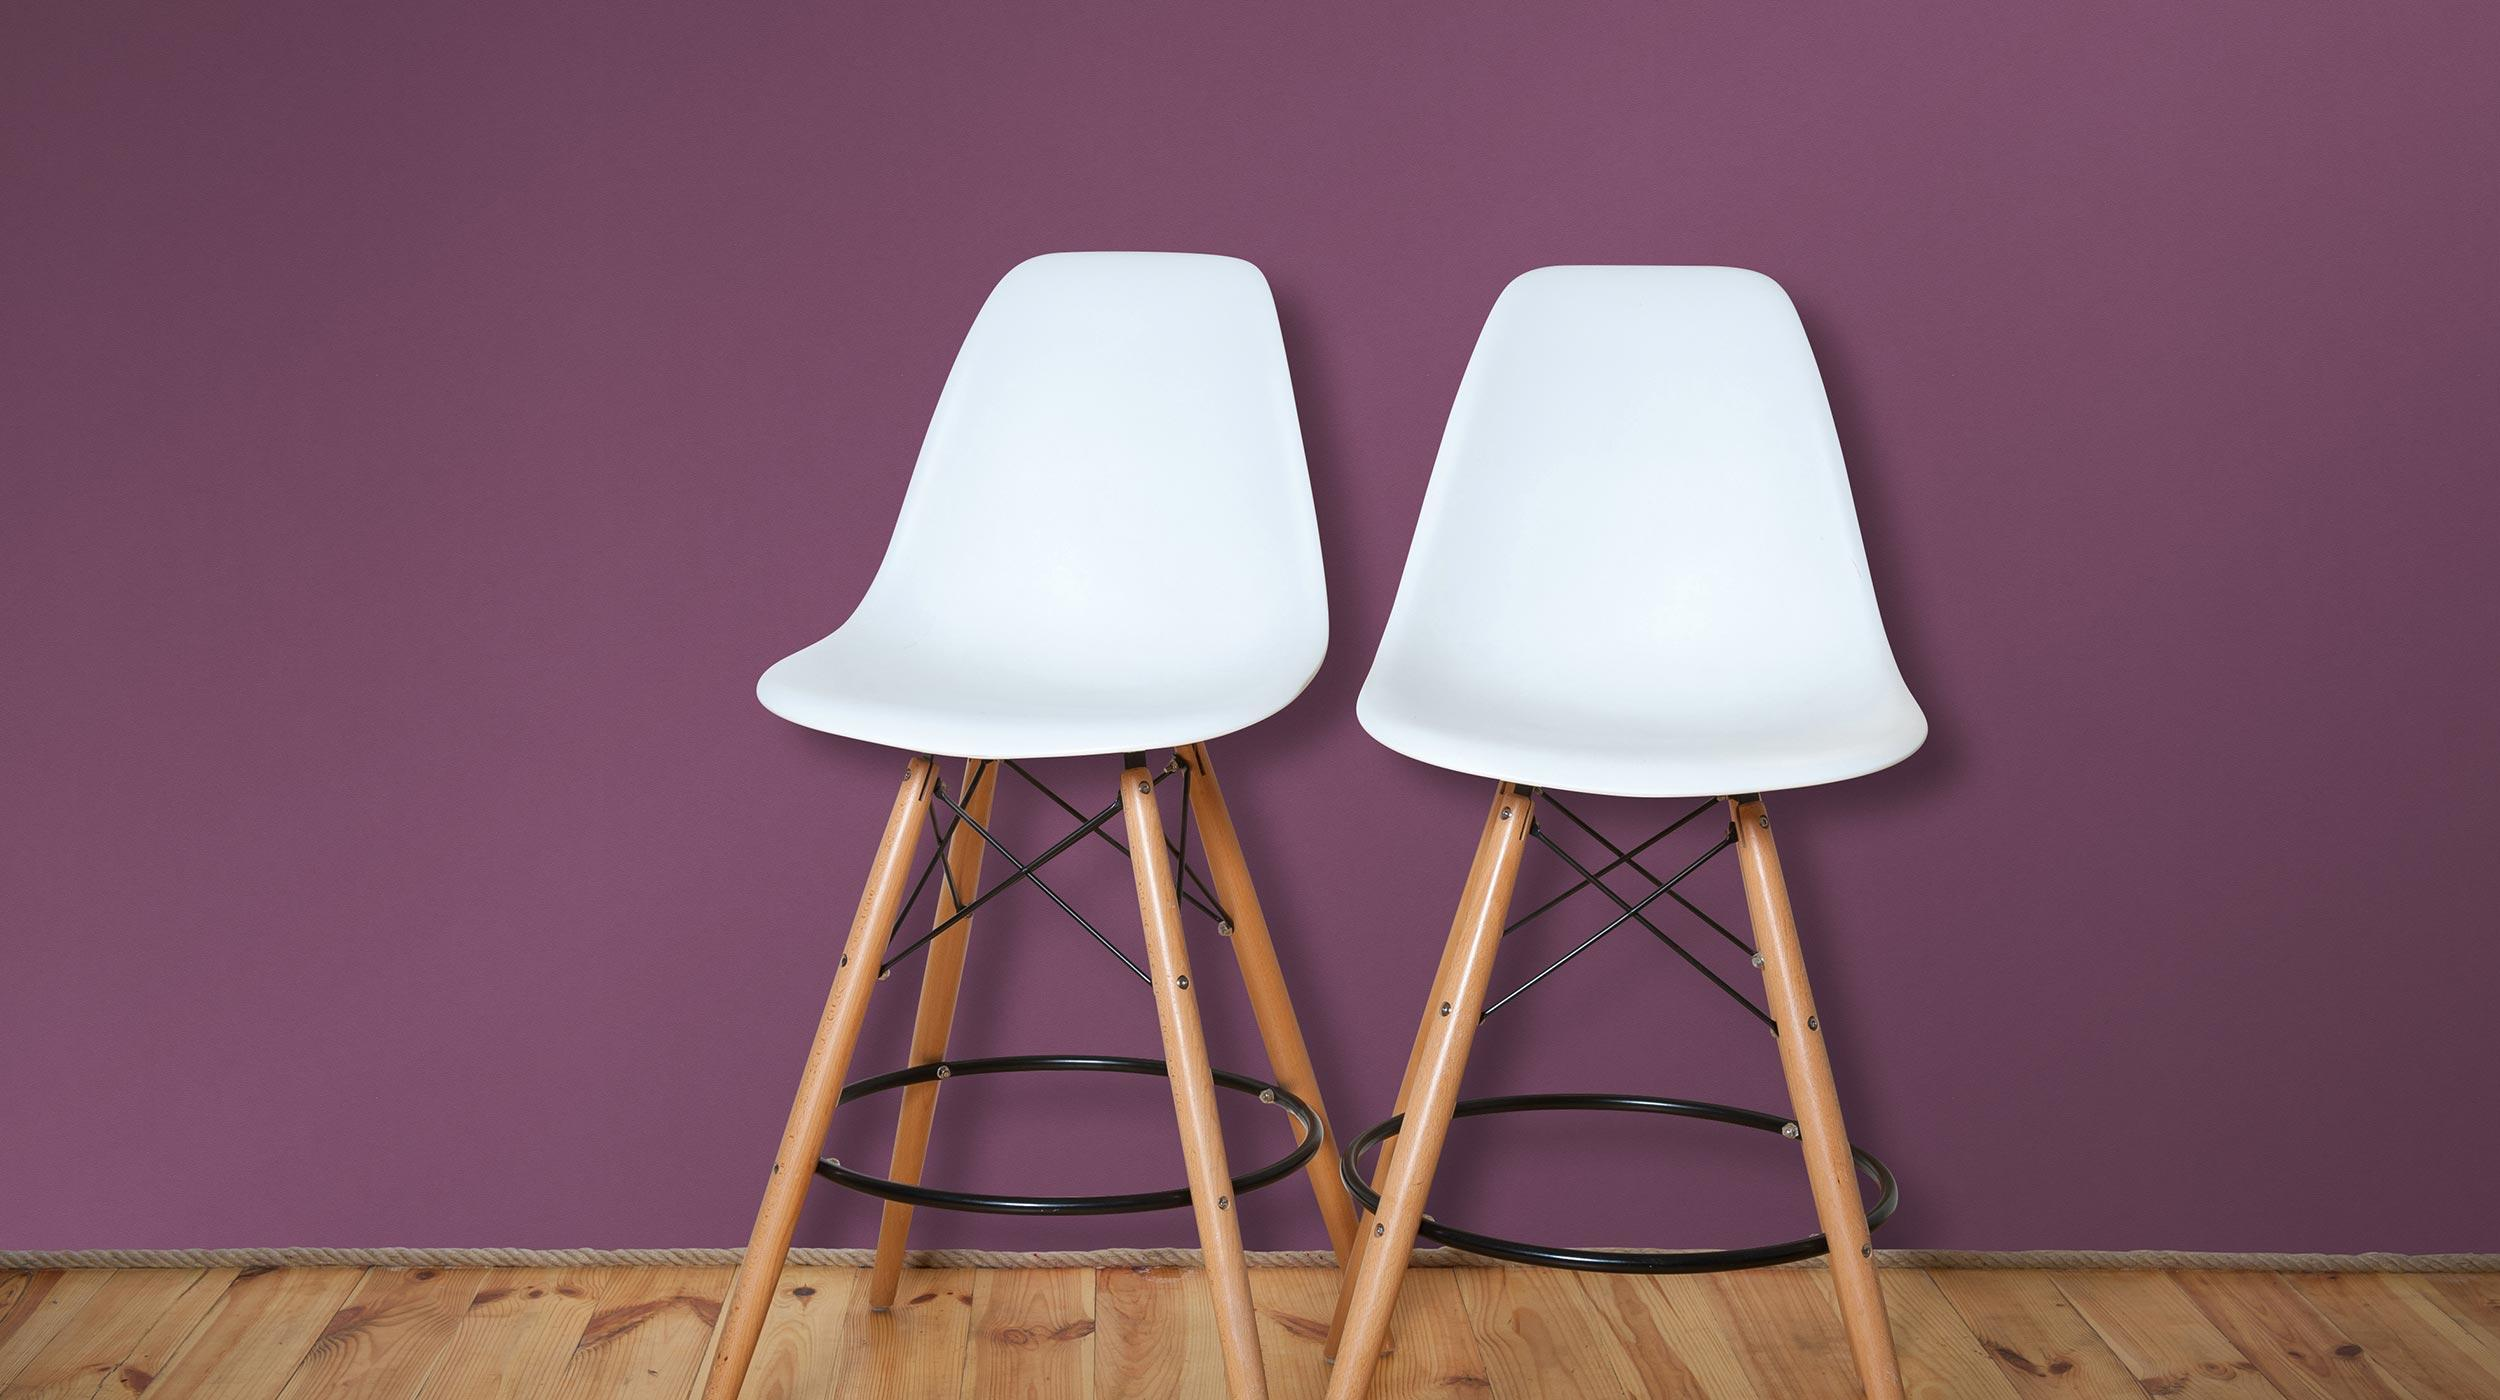 Vliestapete Unistruktur in dunklem Violett Kollektion Colour Stories, Barhocker, Holzboden